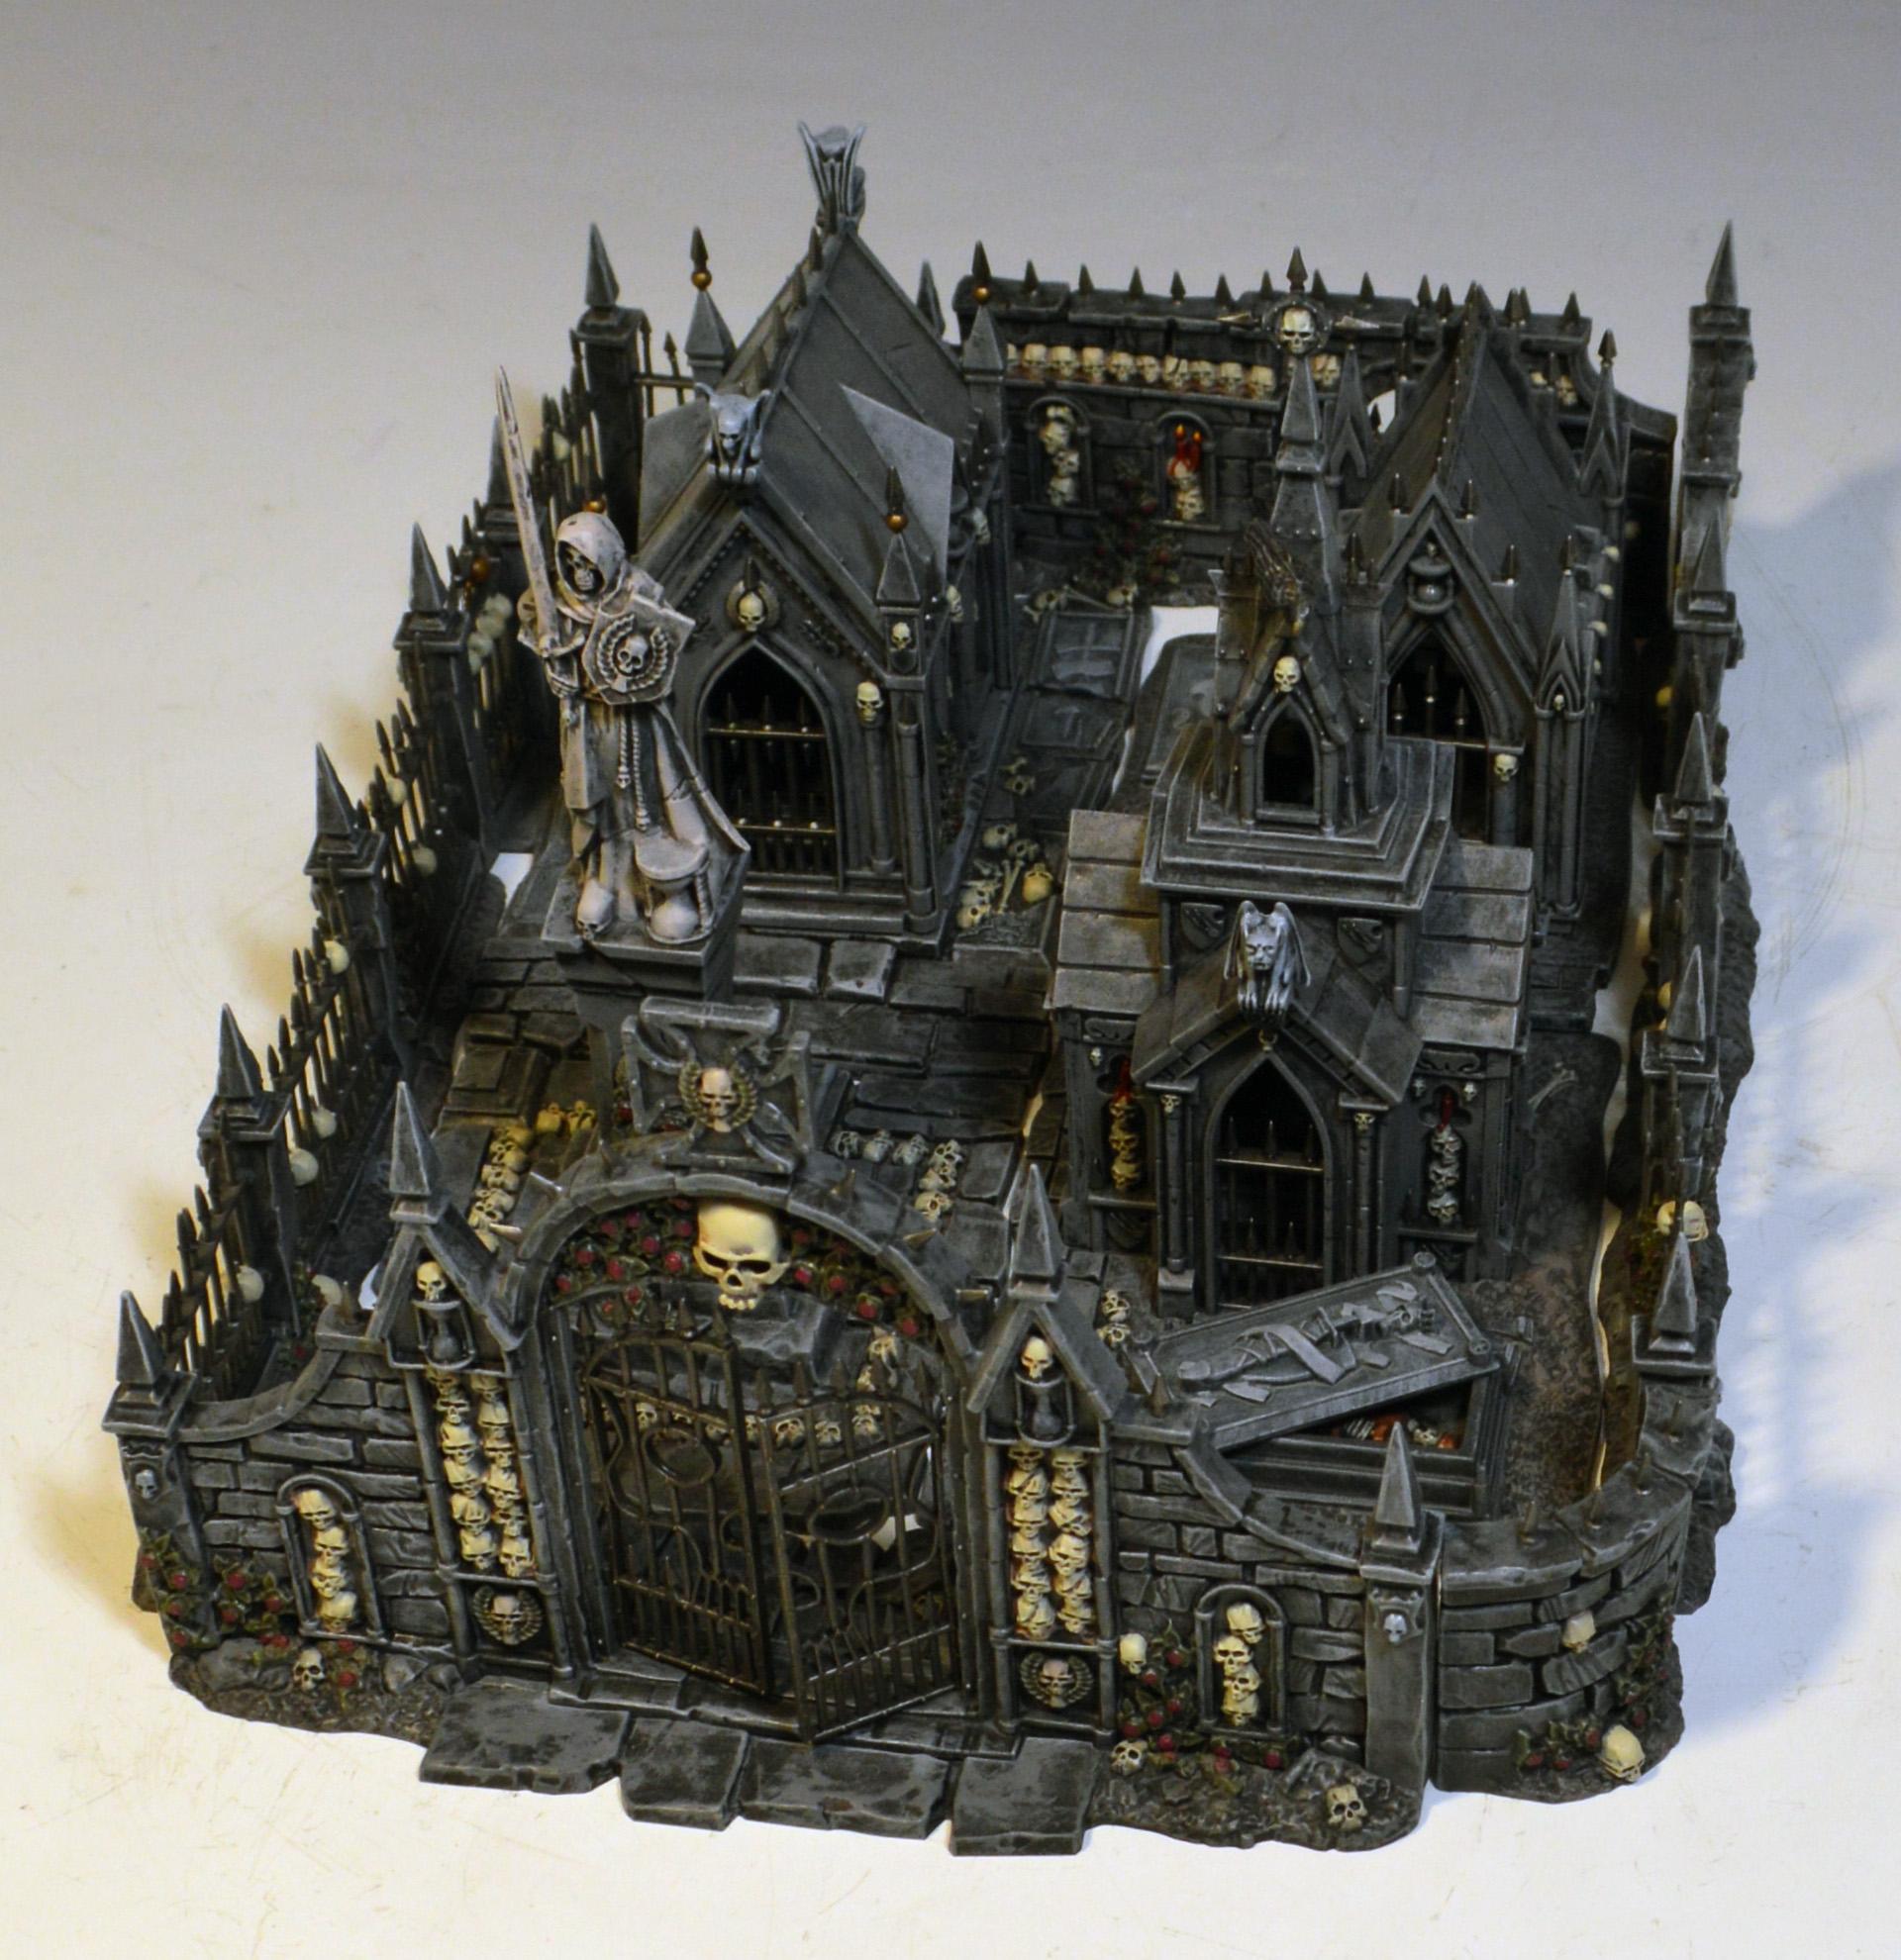 Cemetery, Graveyard, Morr, Terrain, Warhammer Fantasy